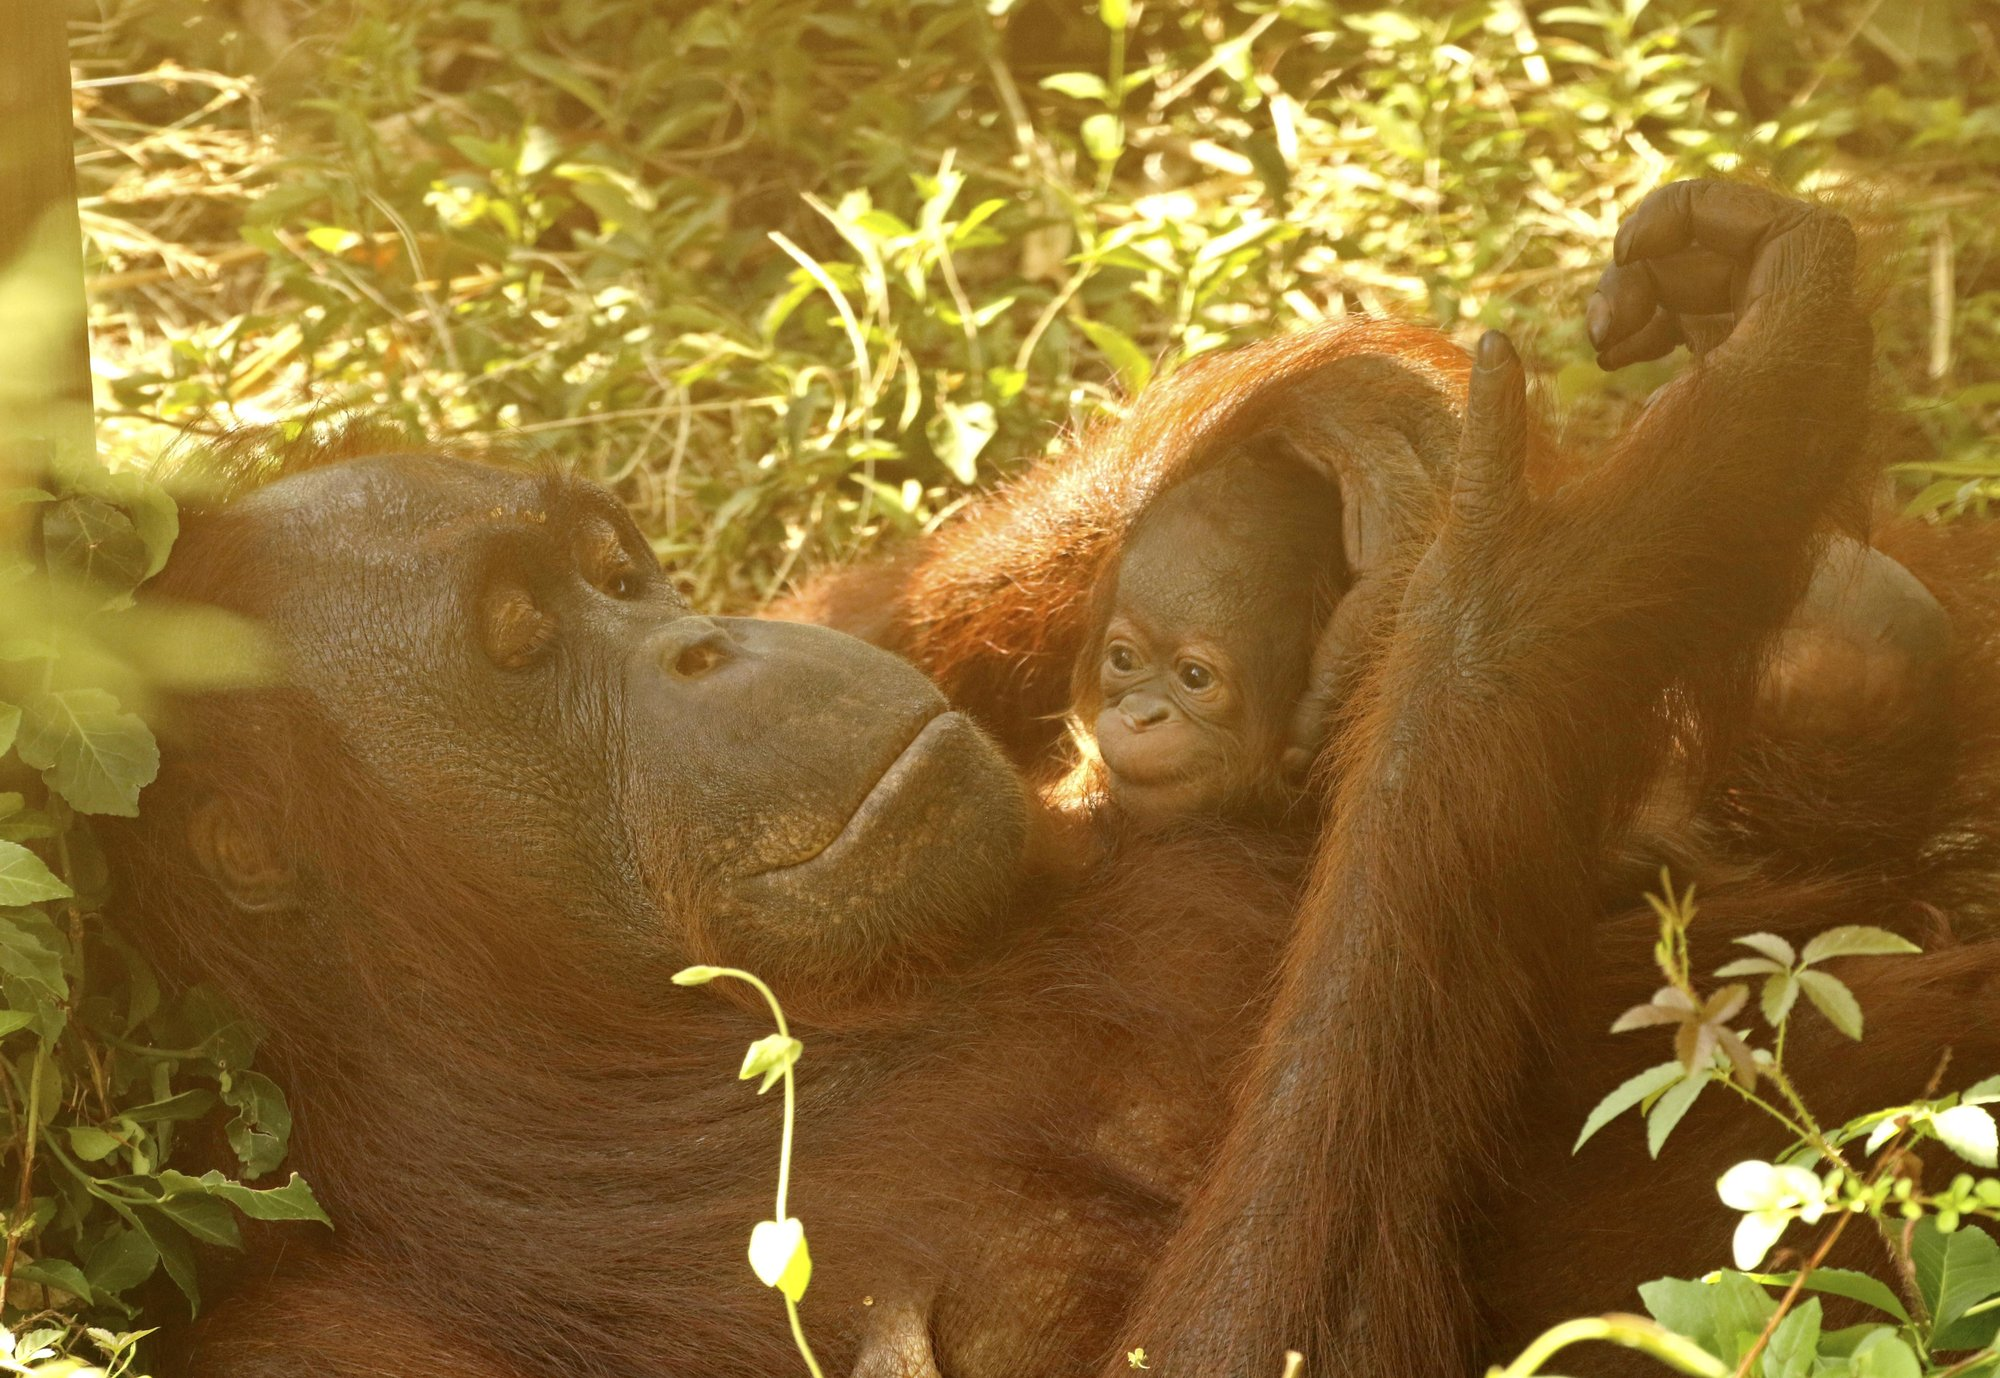 Baby orangutan born at Little Rock Zoo